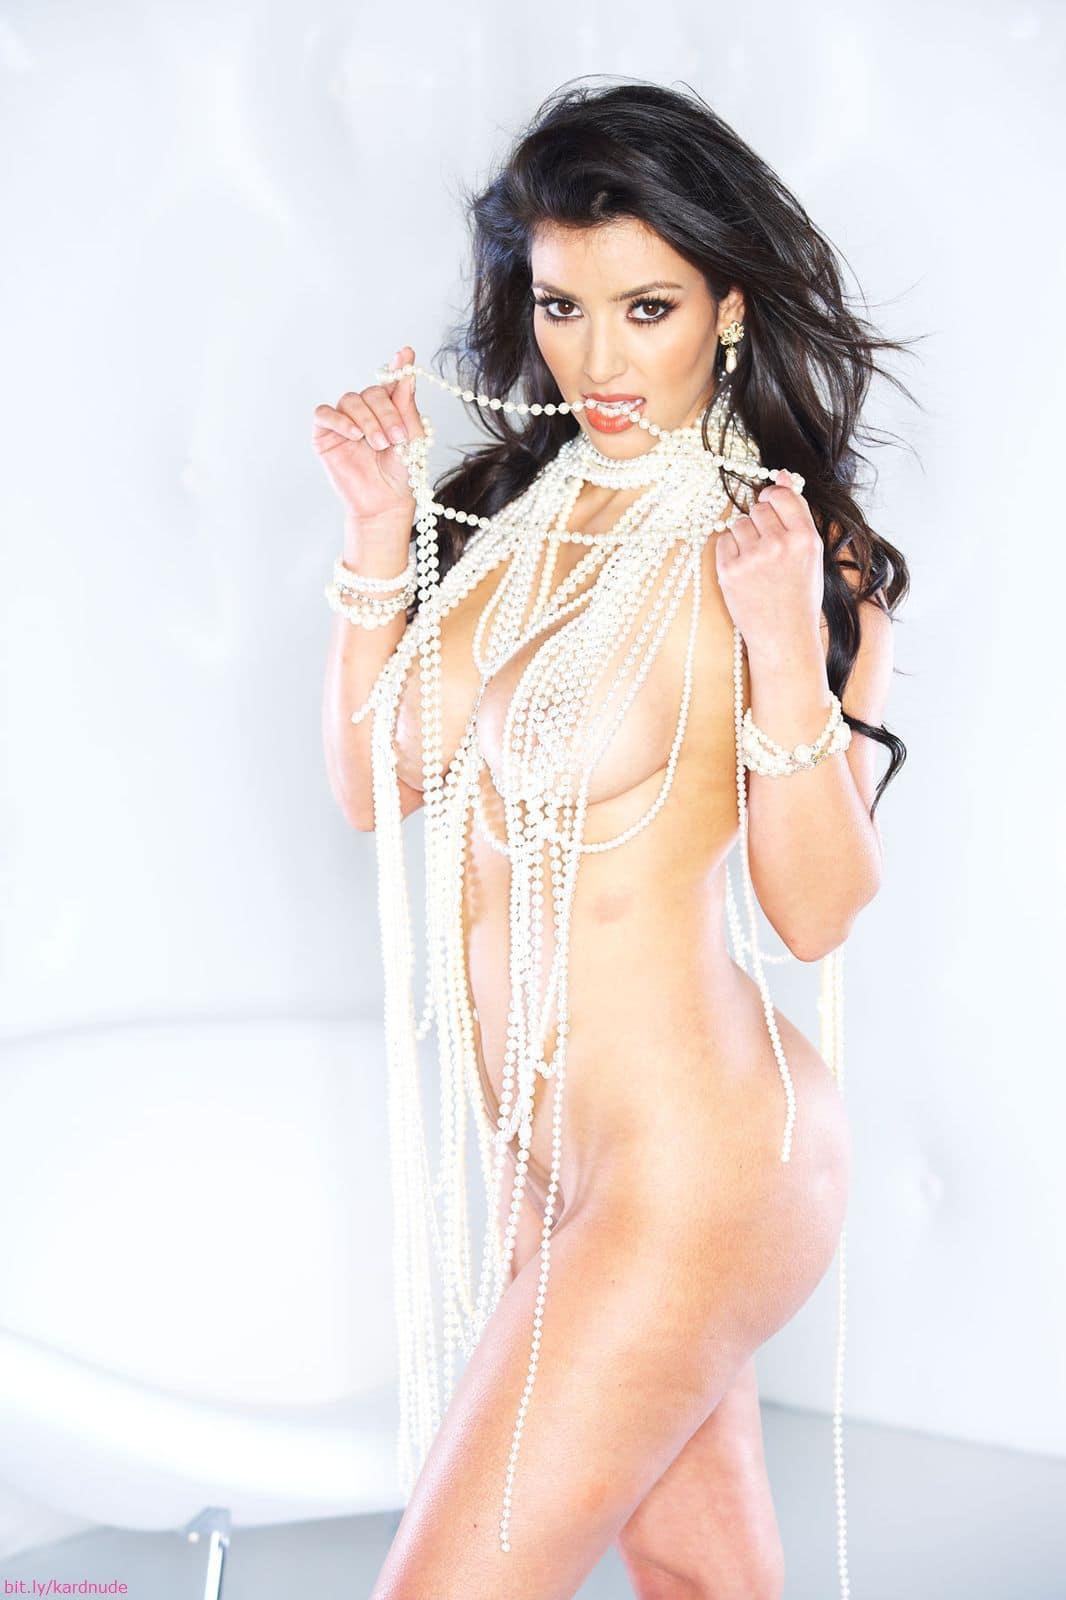 beautiful naked girl poster